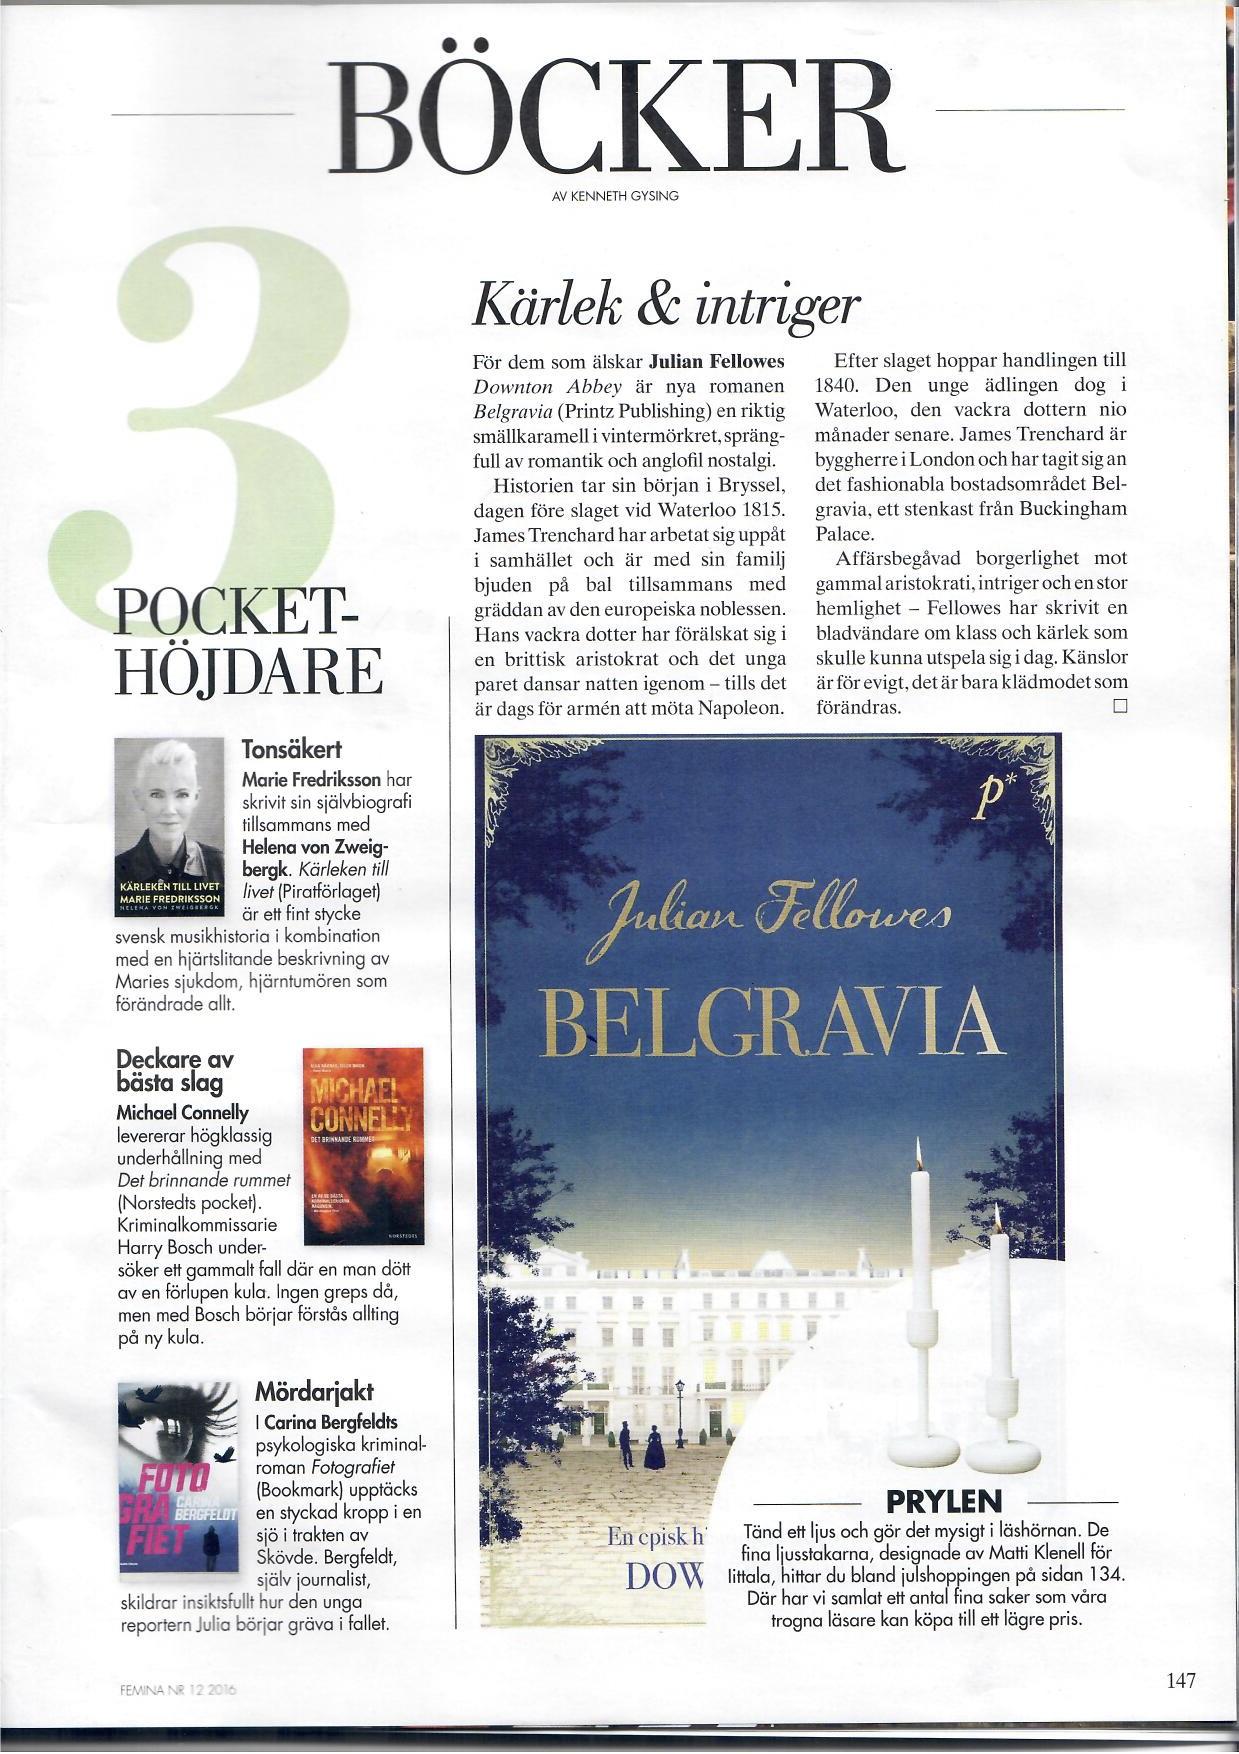 femina-printz-publishing-20161116-belgravia